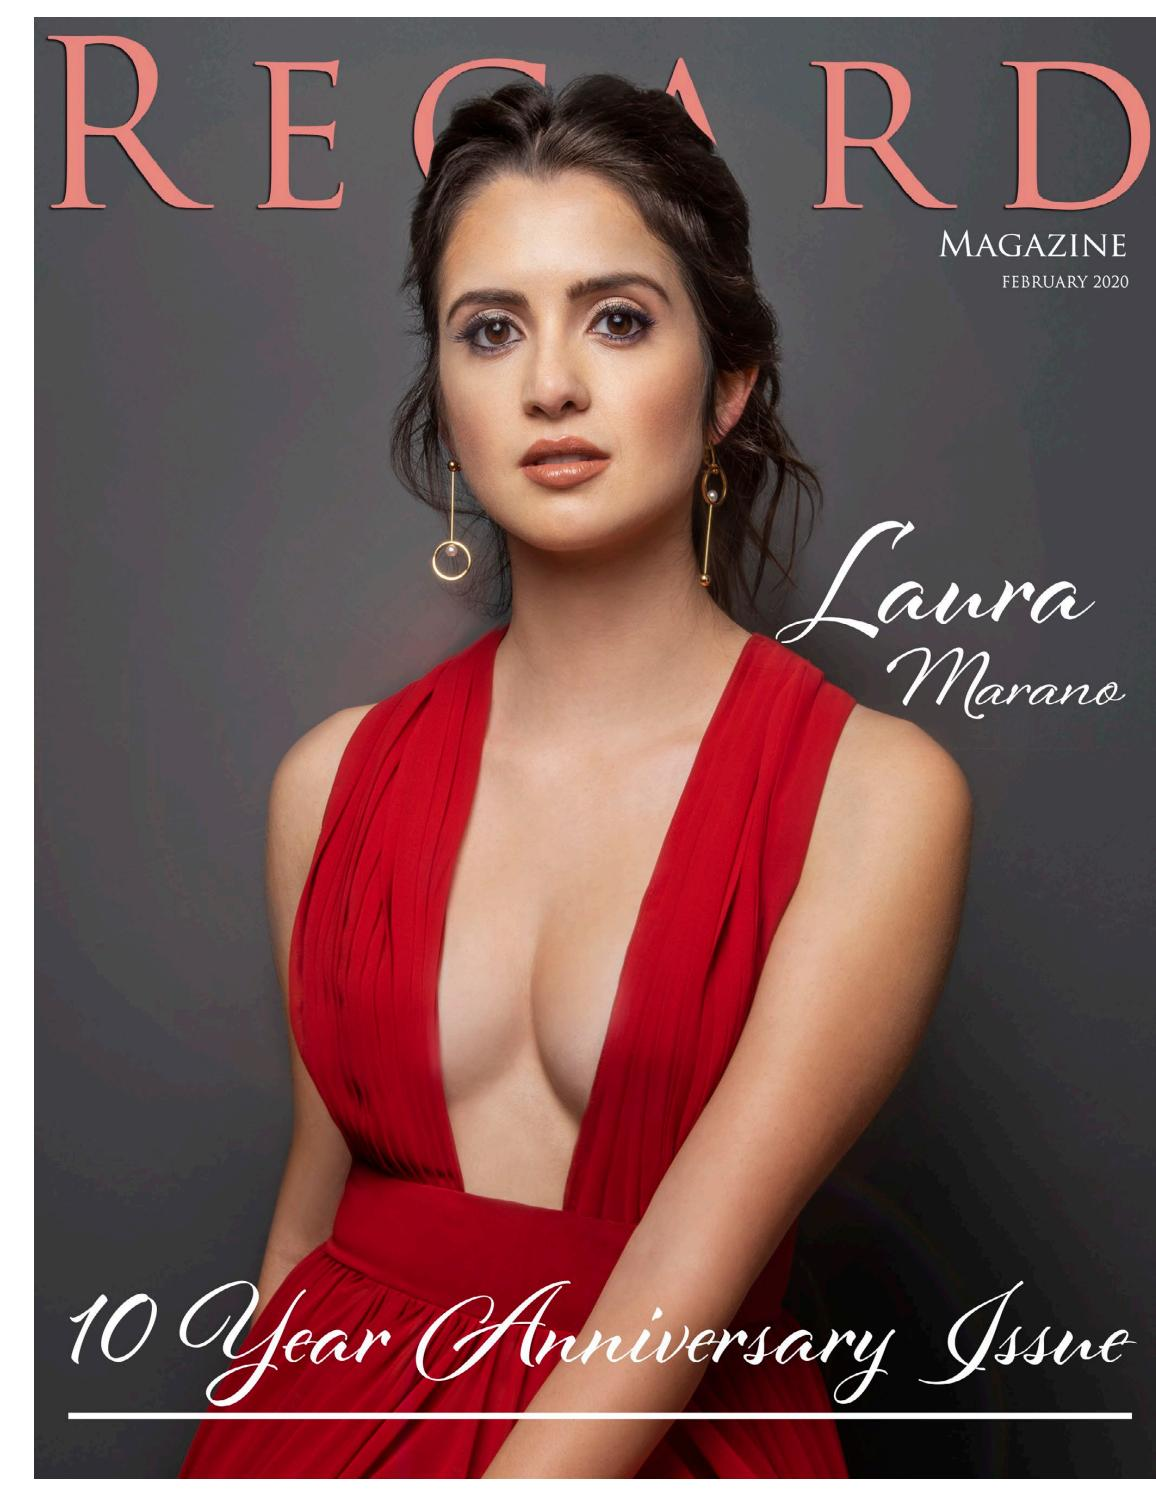 Laura Marano - Regard Magazine (Feb 2020 issue)